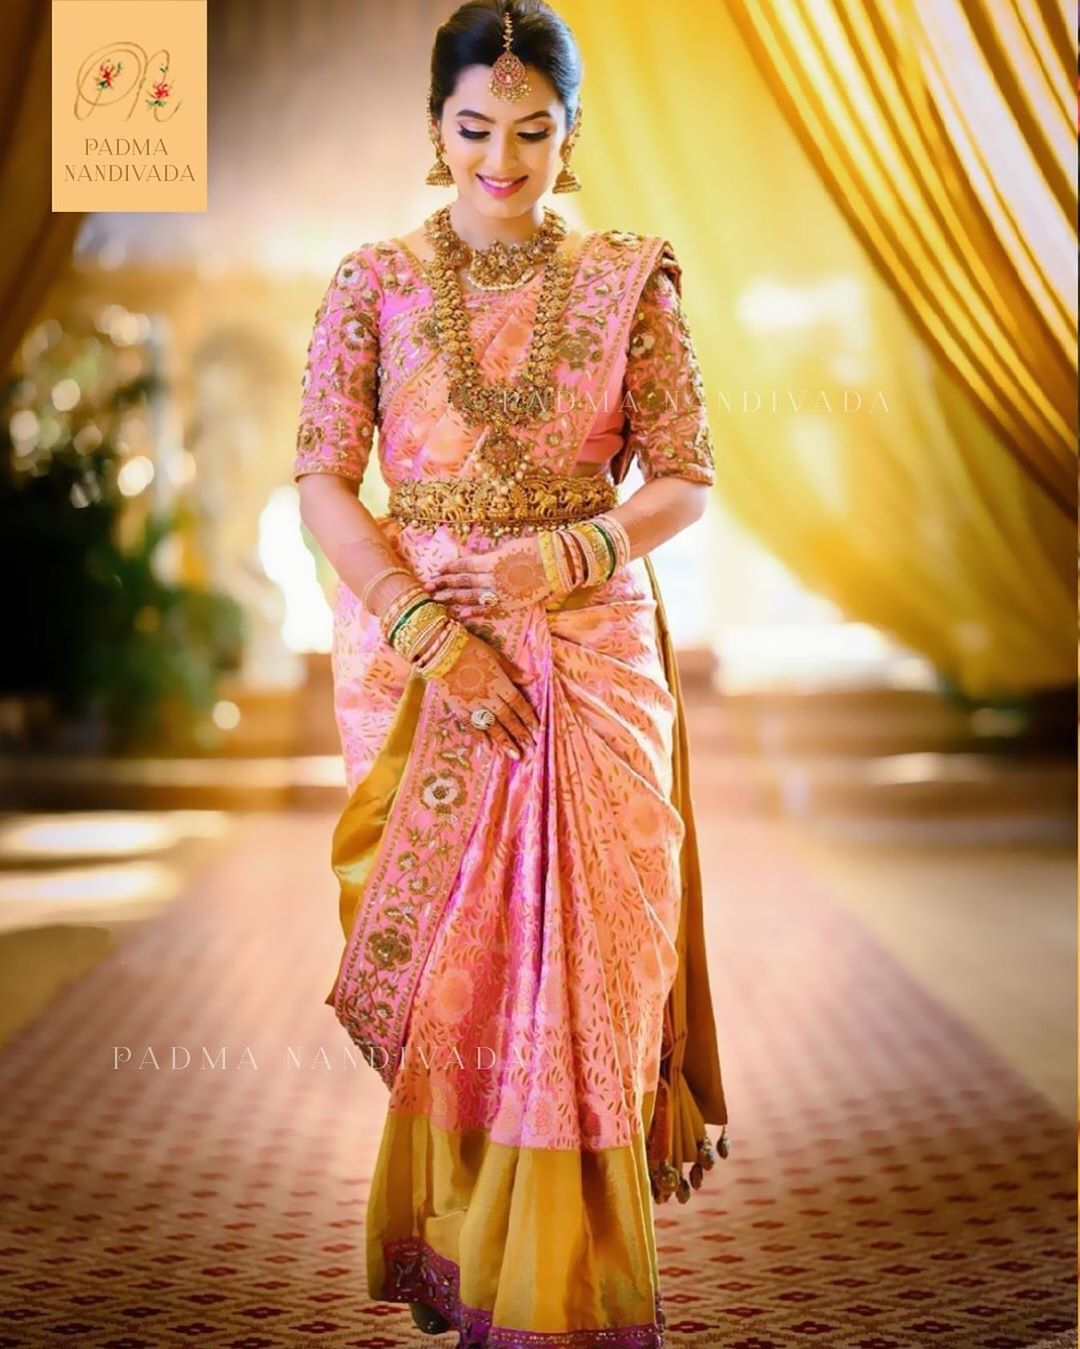 Yuga S Women Fashion Lifestyle In 2020 Bridal Sarees South Indian Bridal Blouse Designs South Indian Wedding Saree